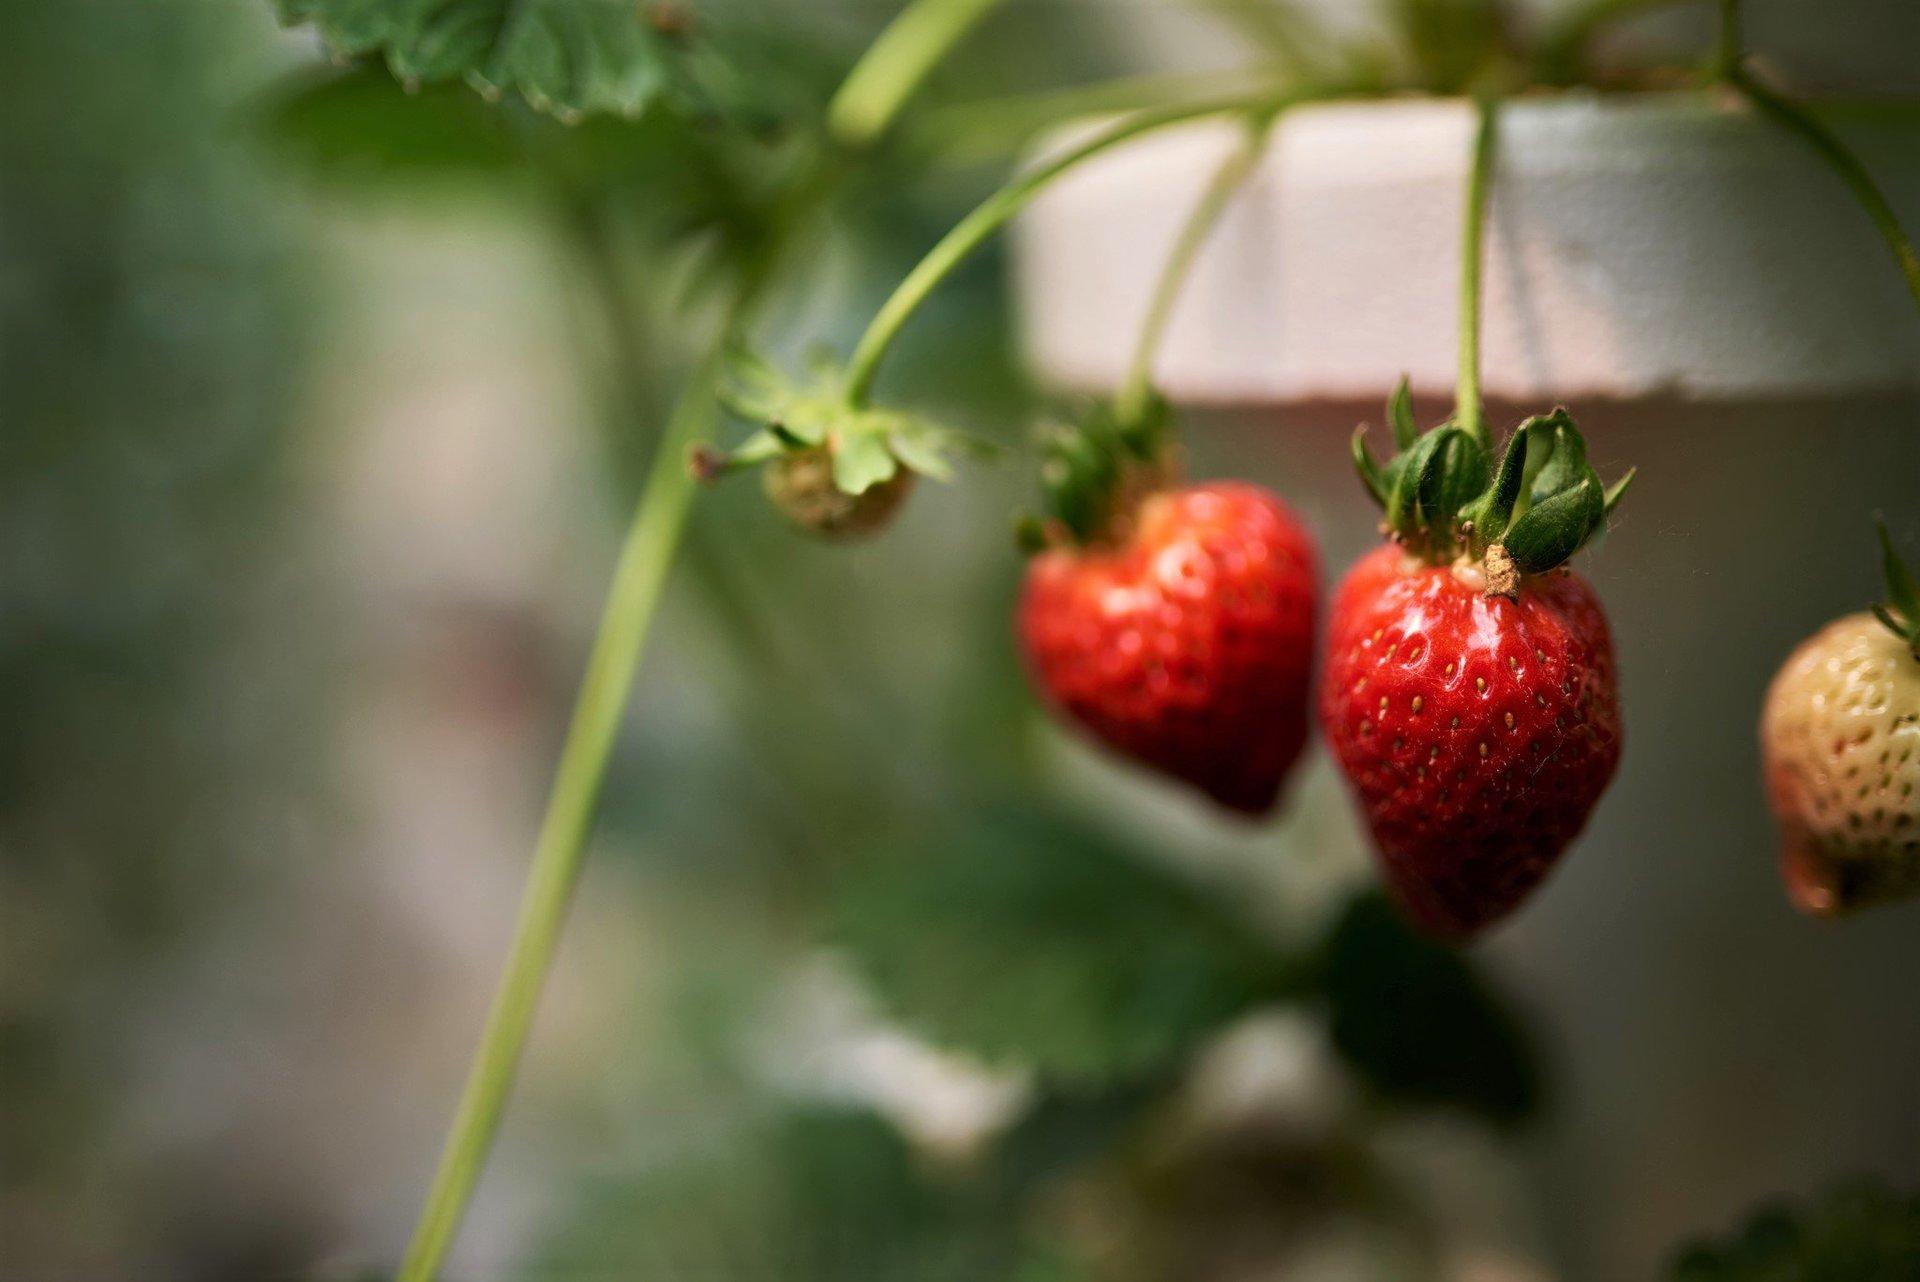 Hydroponic Strawberries photo